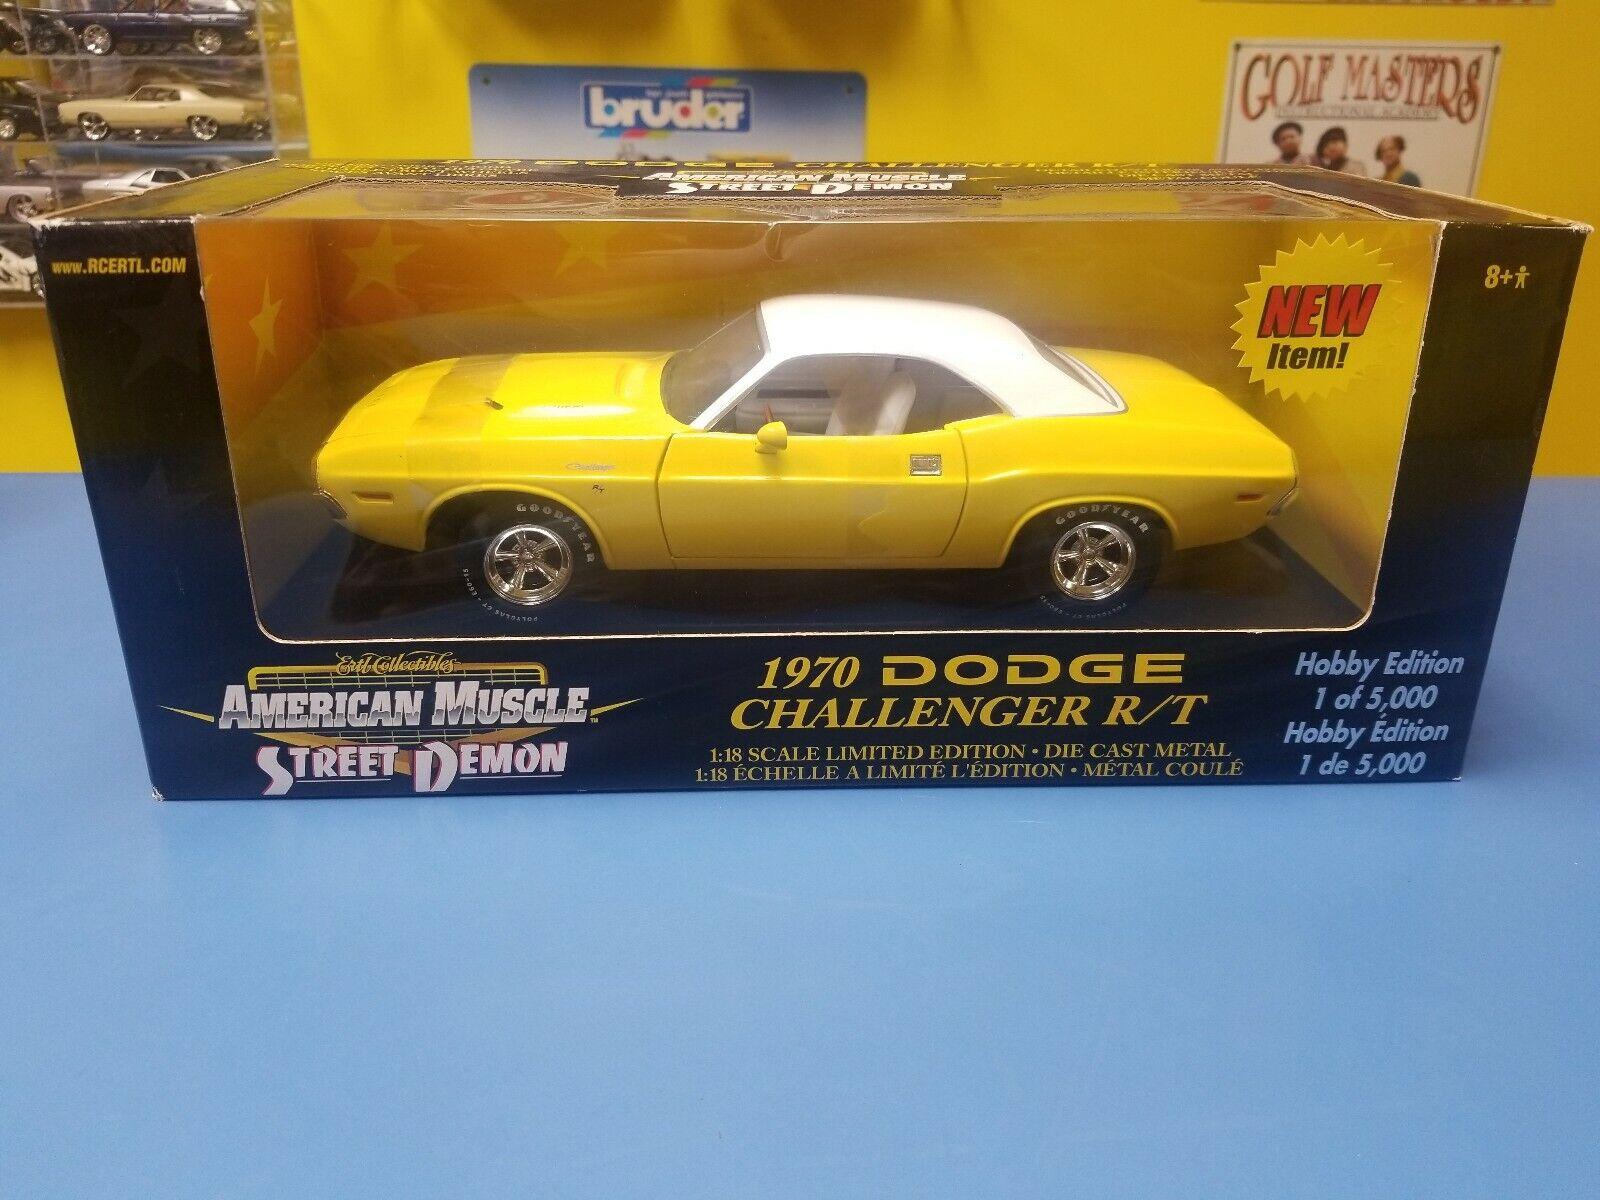 ERTL american muscle street Demon 1970 Dodge Challenger RT Hobby Edition jaune